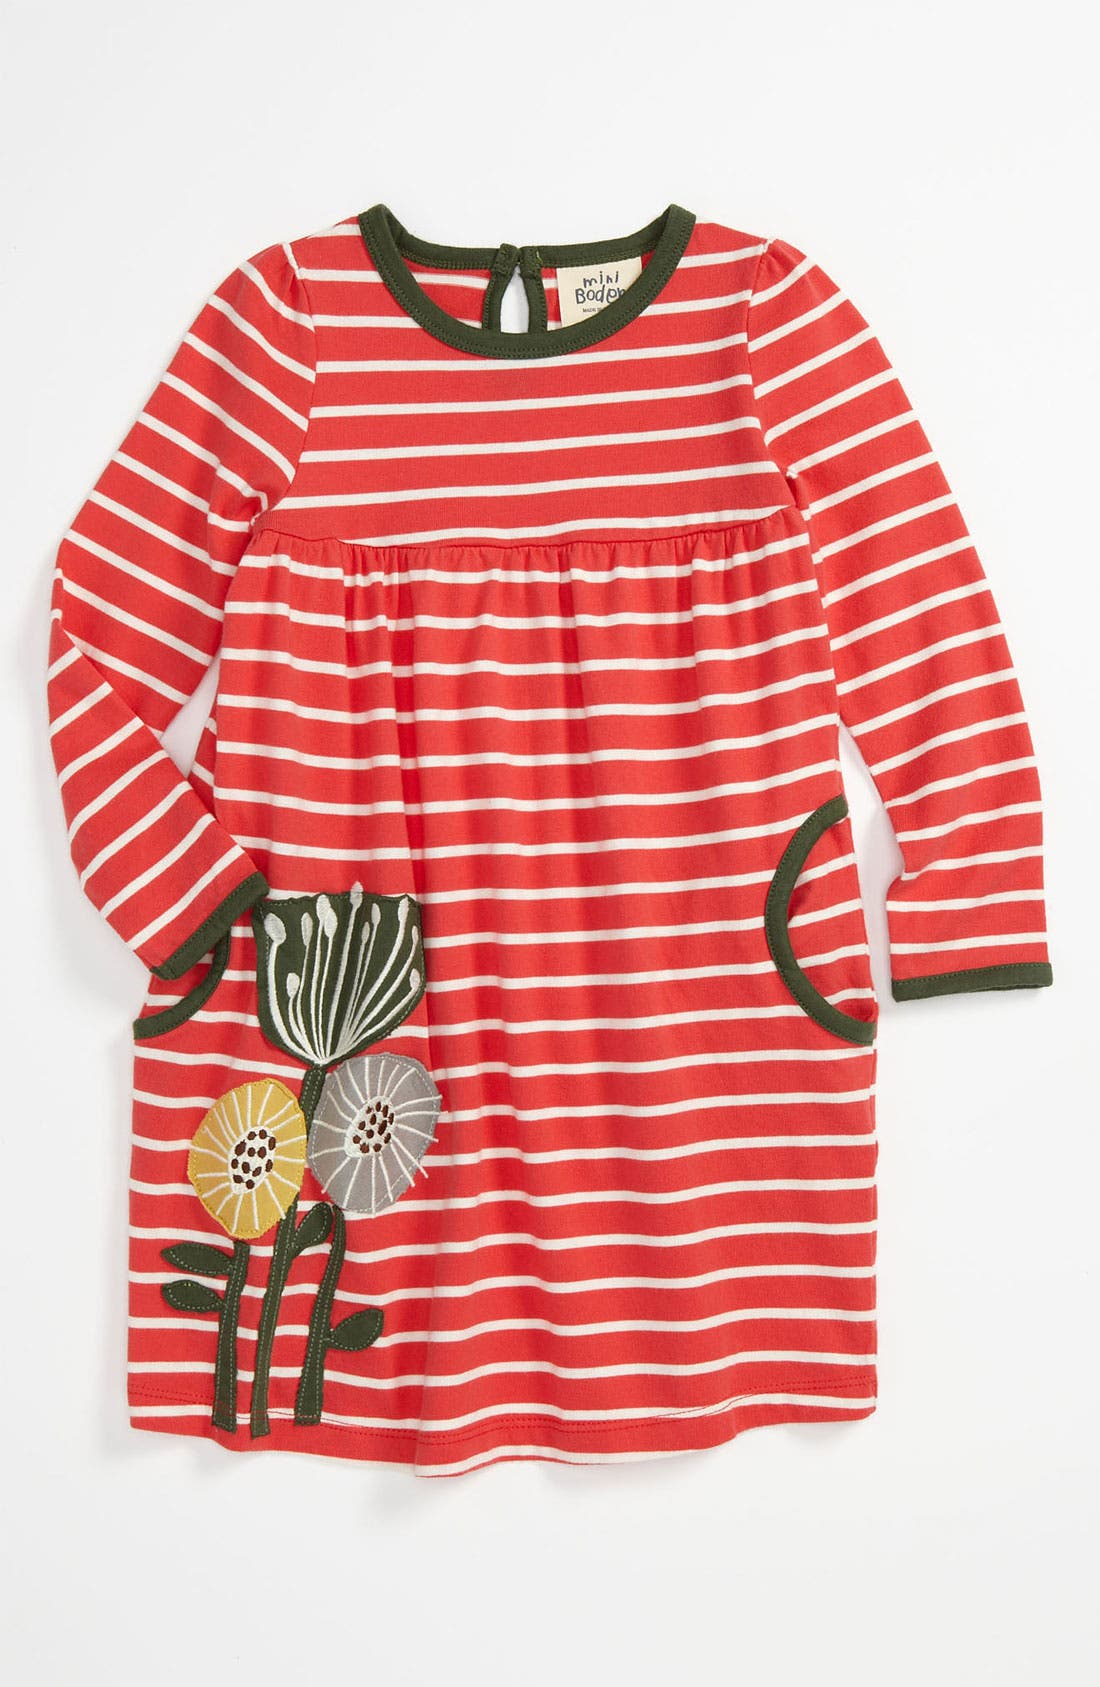 Alternate Image 1 Selected - Mini Boden 'Fun Appliqué' Dress (Toddler)